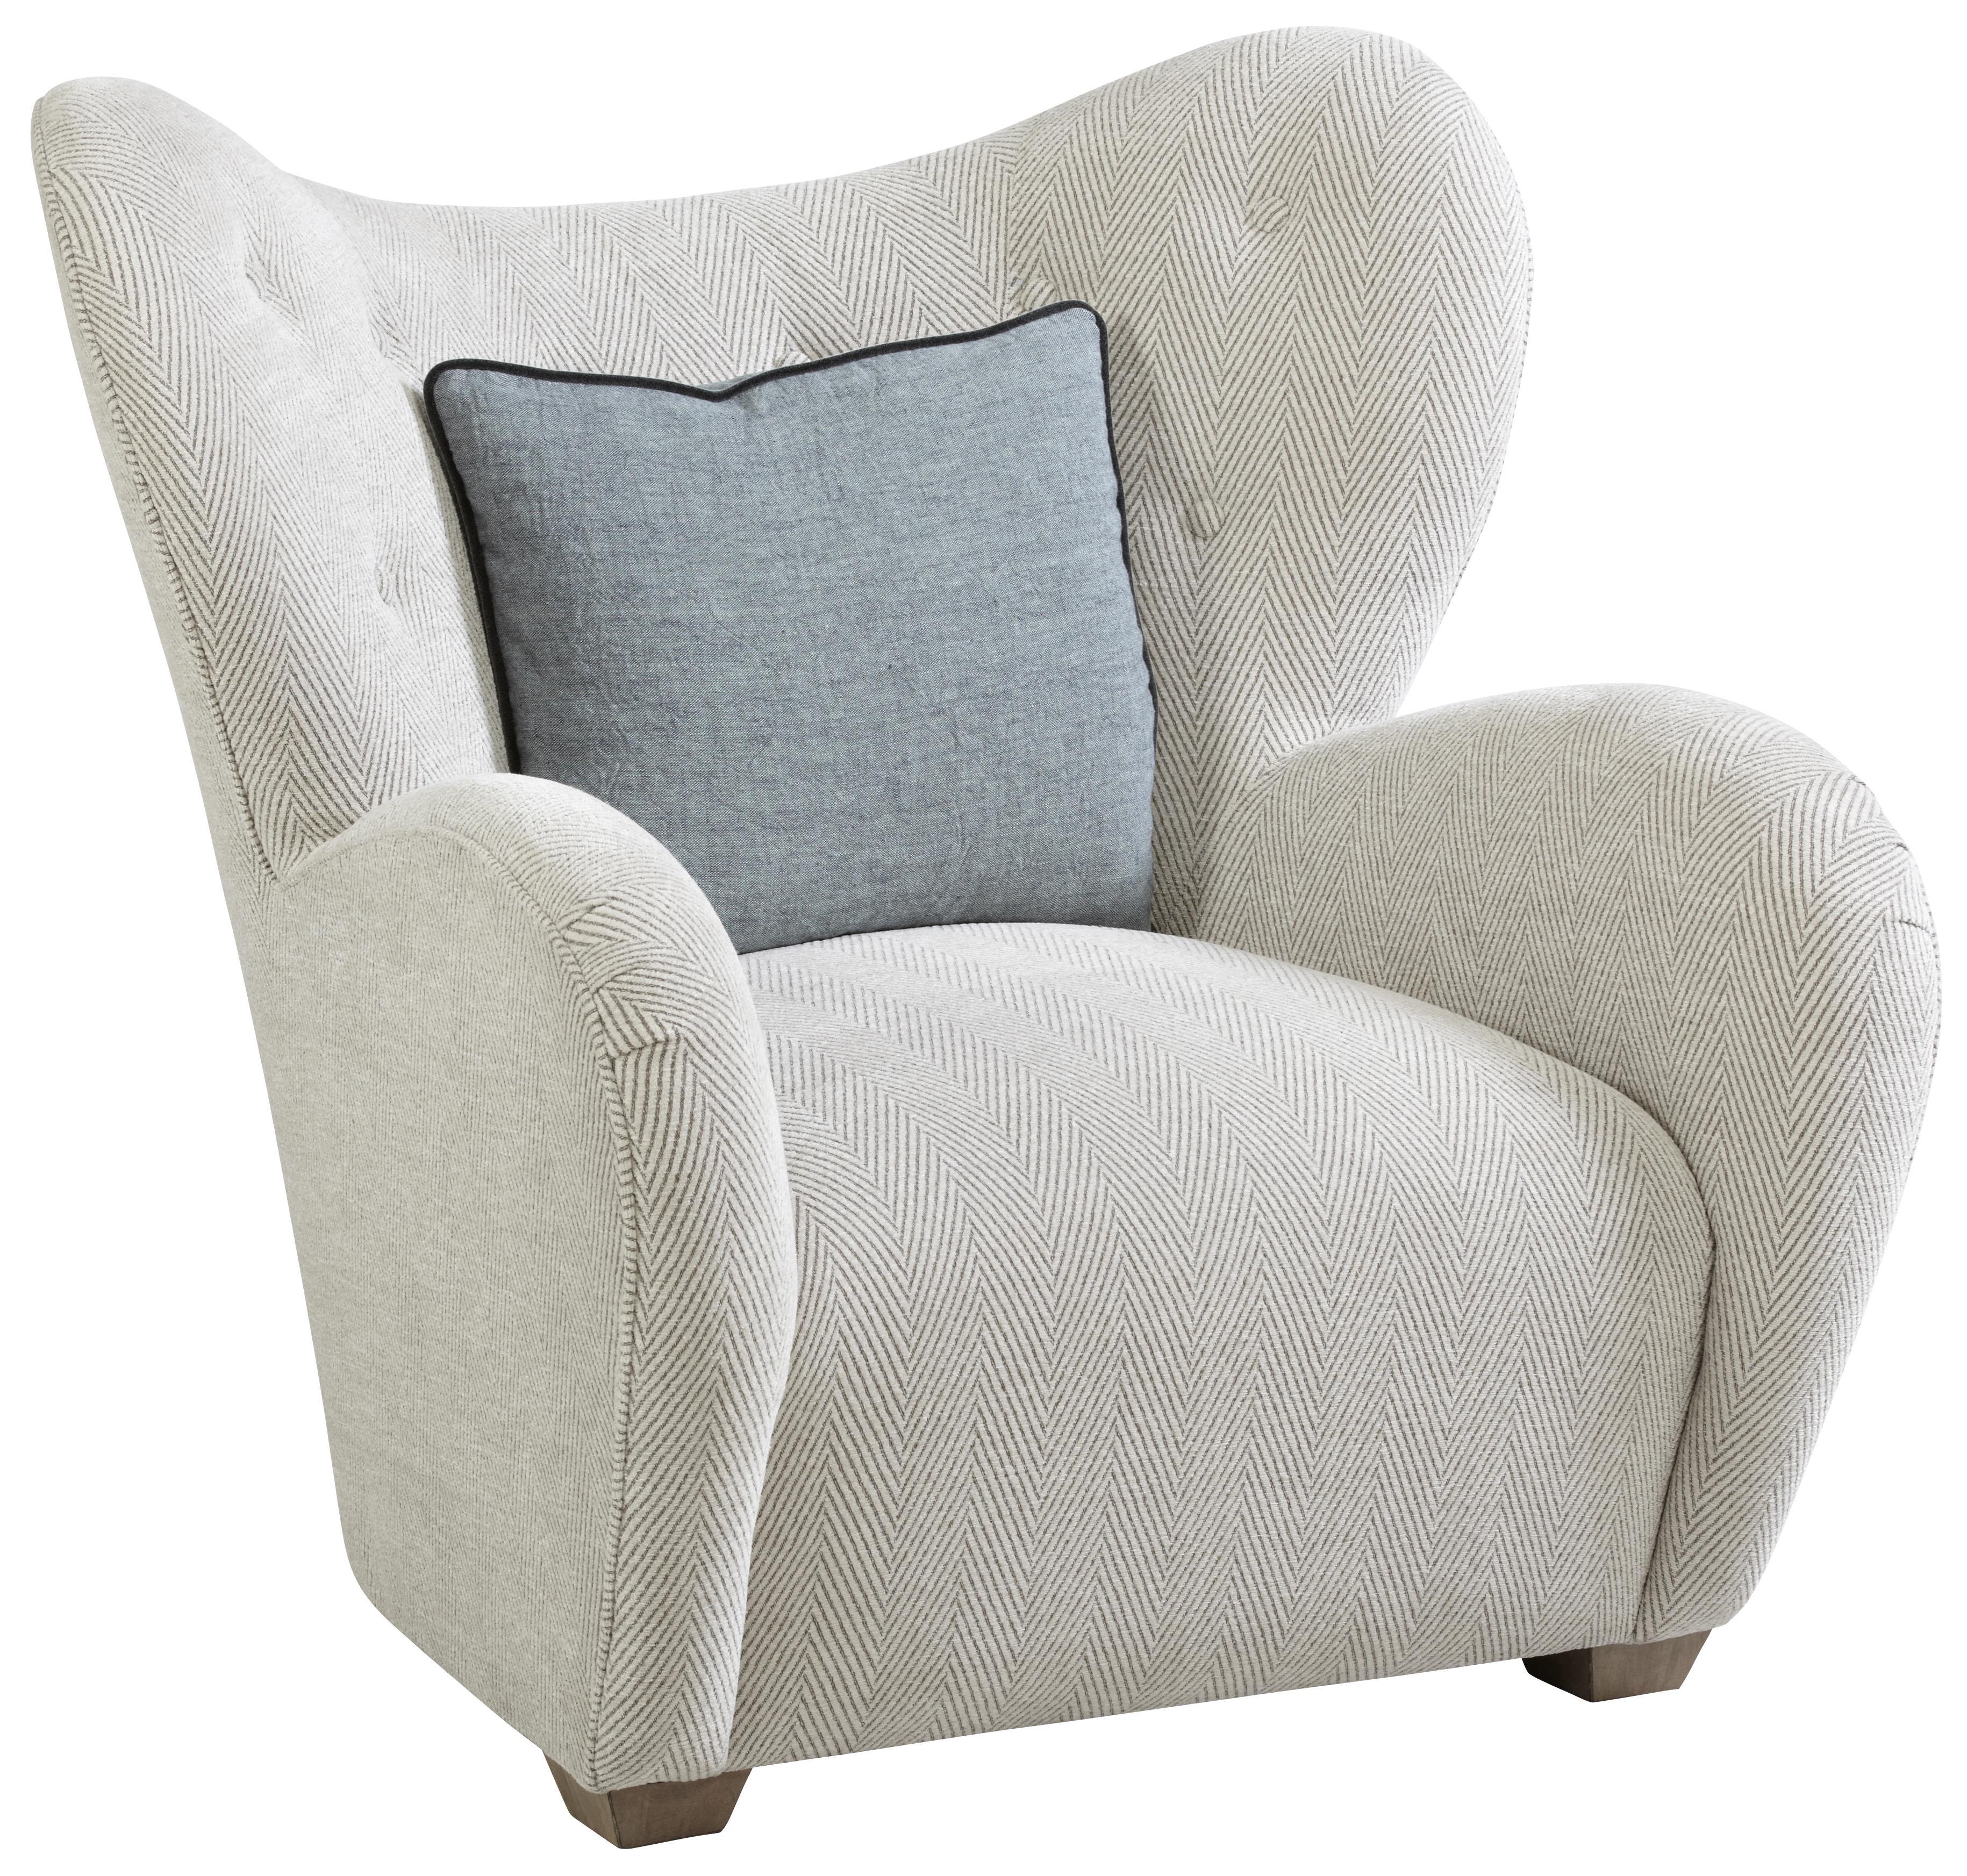 Belfort Signature Urban Treasures Levy Accent Chair - Item Number: 523554-5001AA